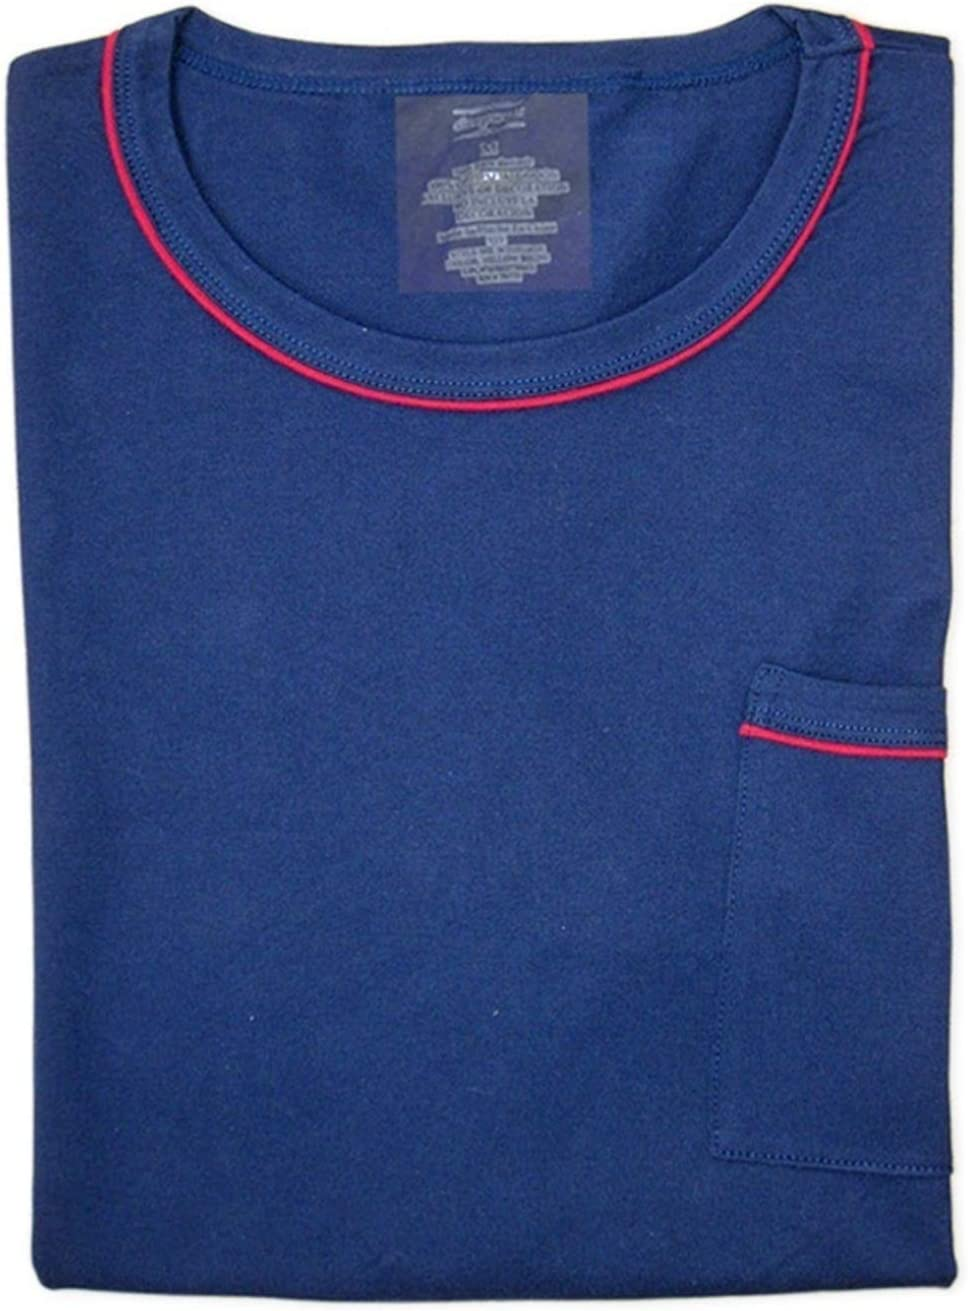 Z.L.FFLZ Sleepwear Sleepwear Men Simple Long Sleeve Pajamas Sets Casual Plaid Trousers Quality Men Homewear Plus Size (Color : Only Blue top, Size : L)